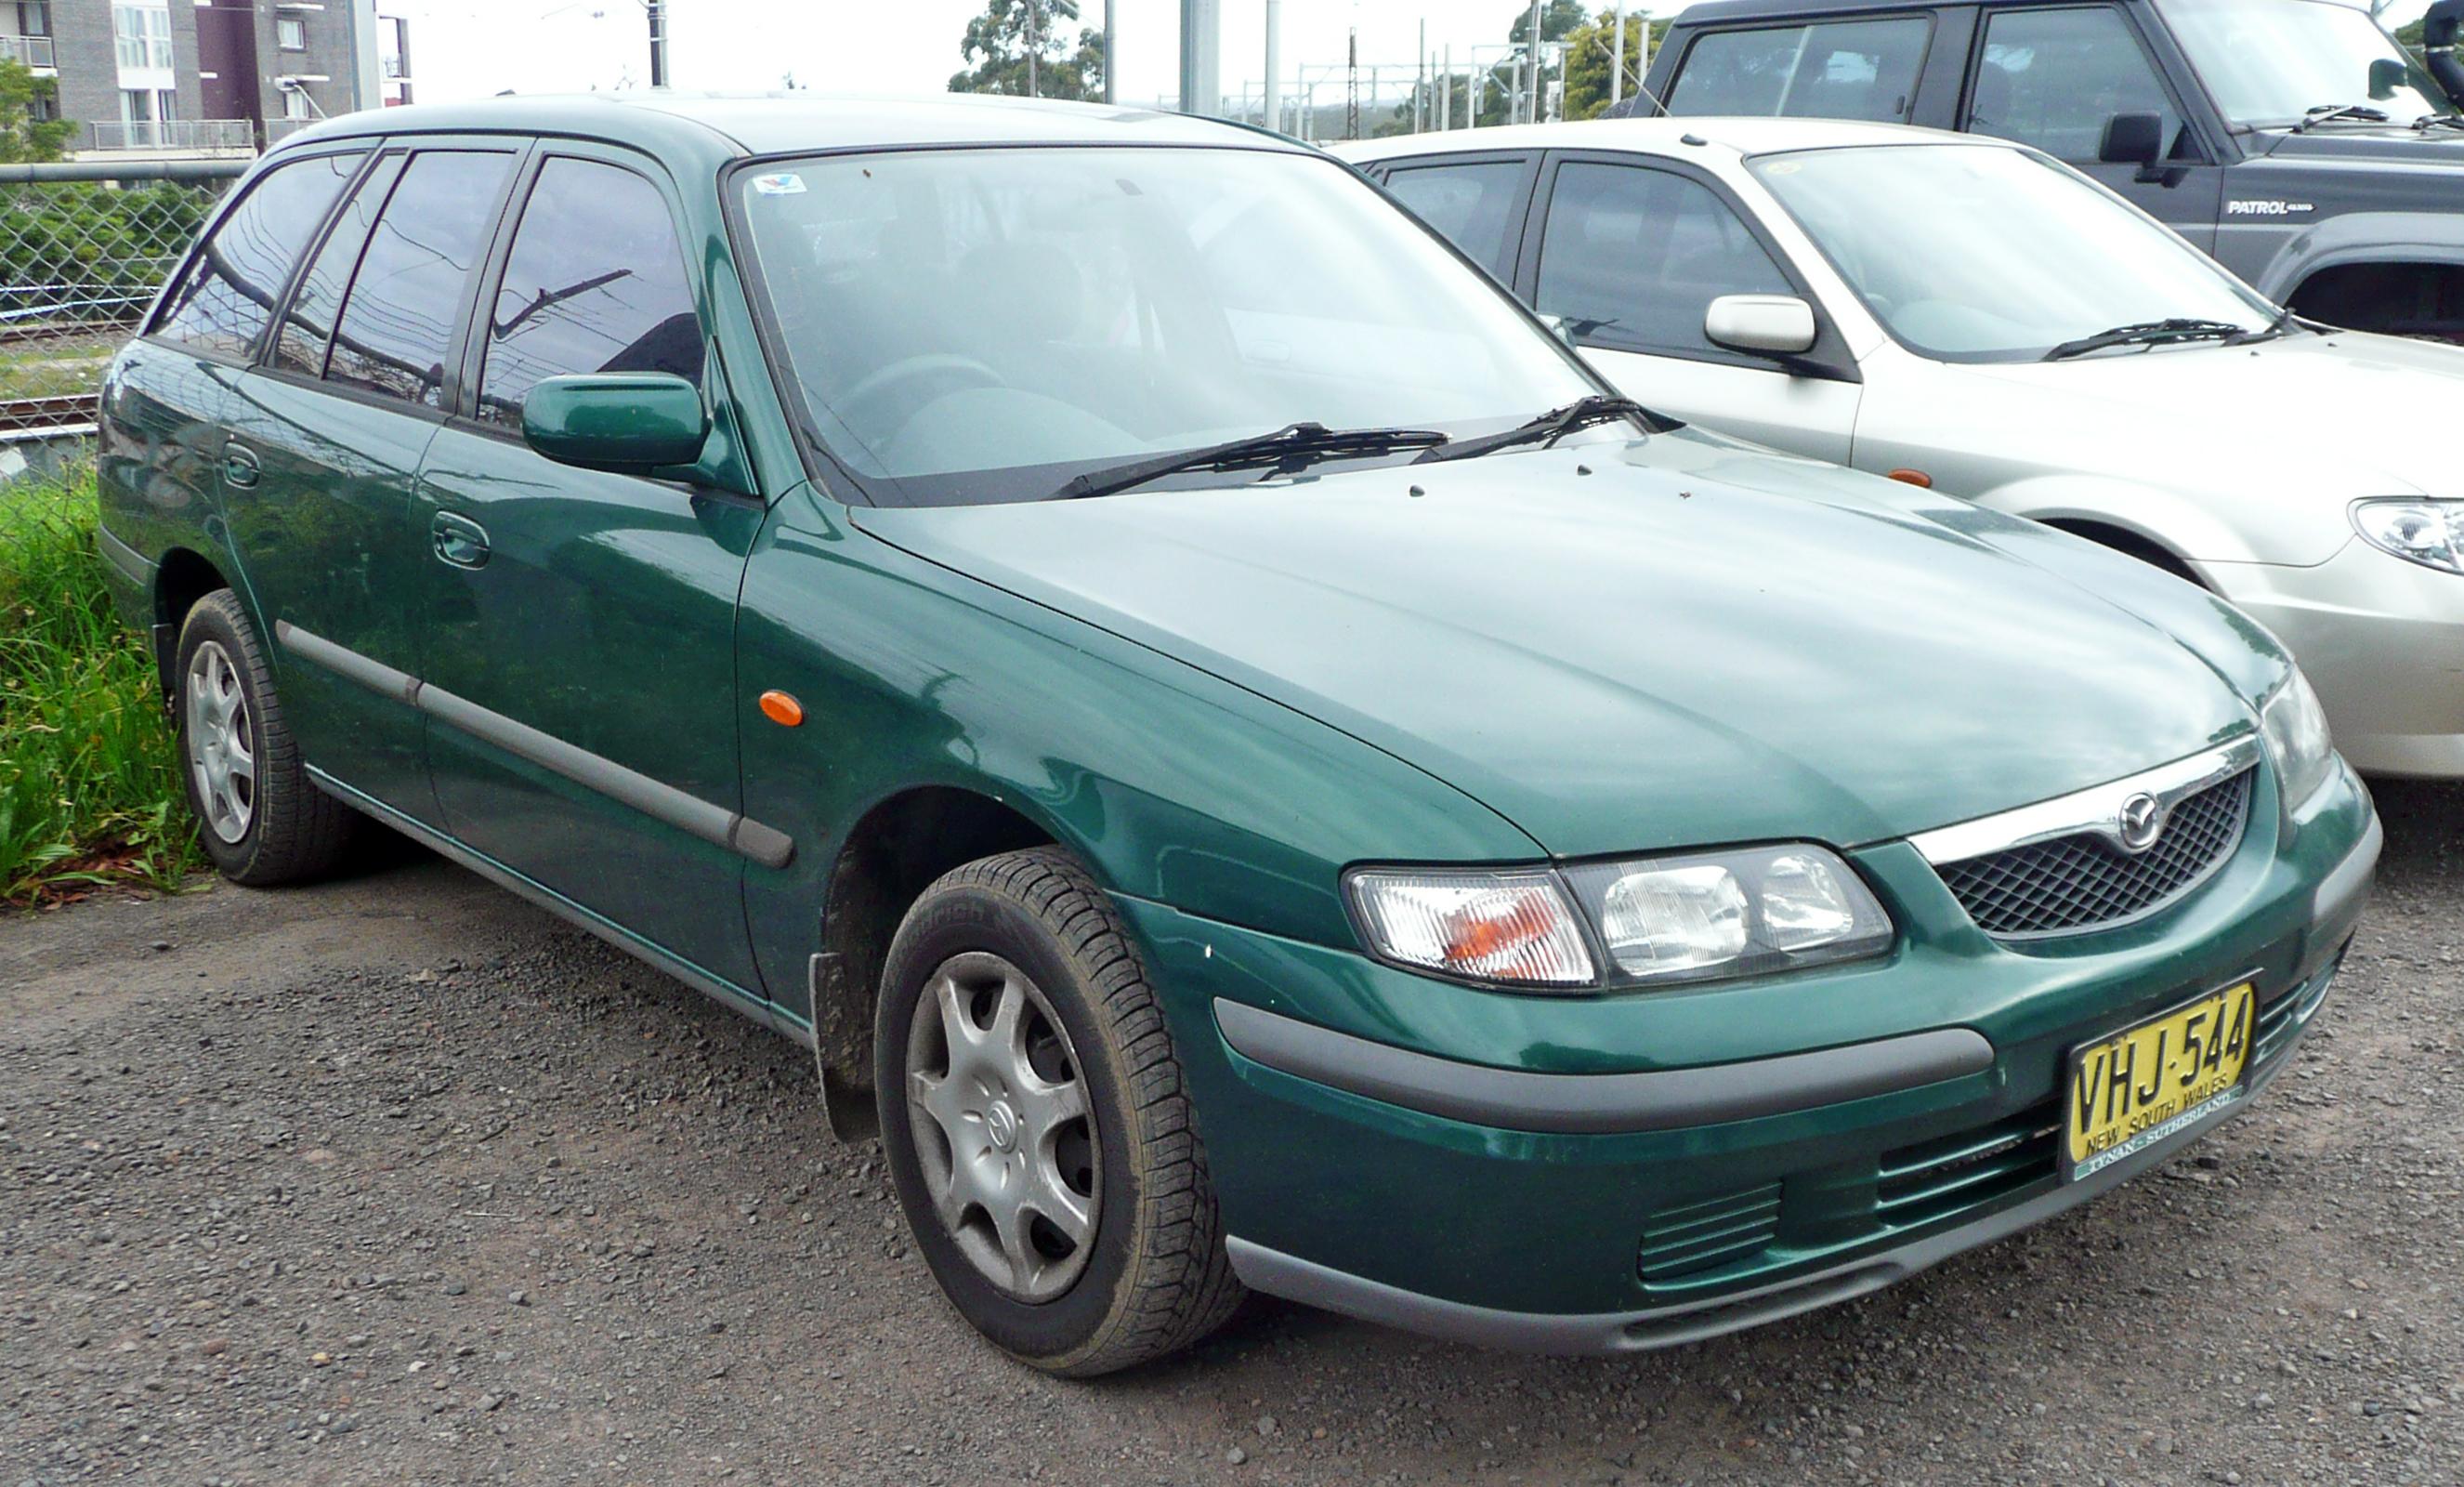 file:1998-1999 mazda 626 (gw) classic station wagon 01